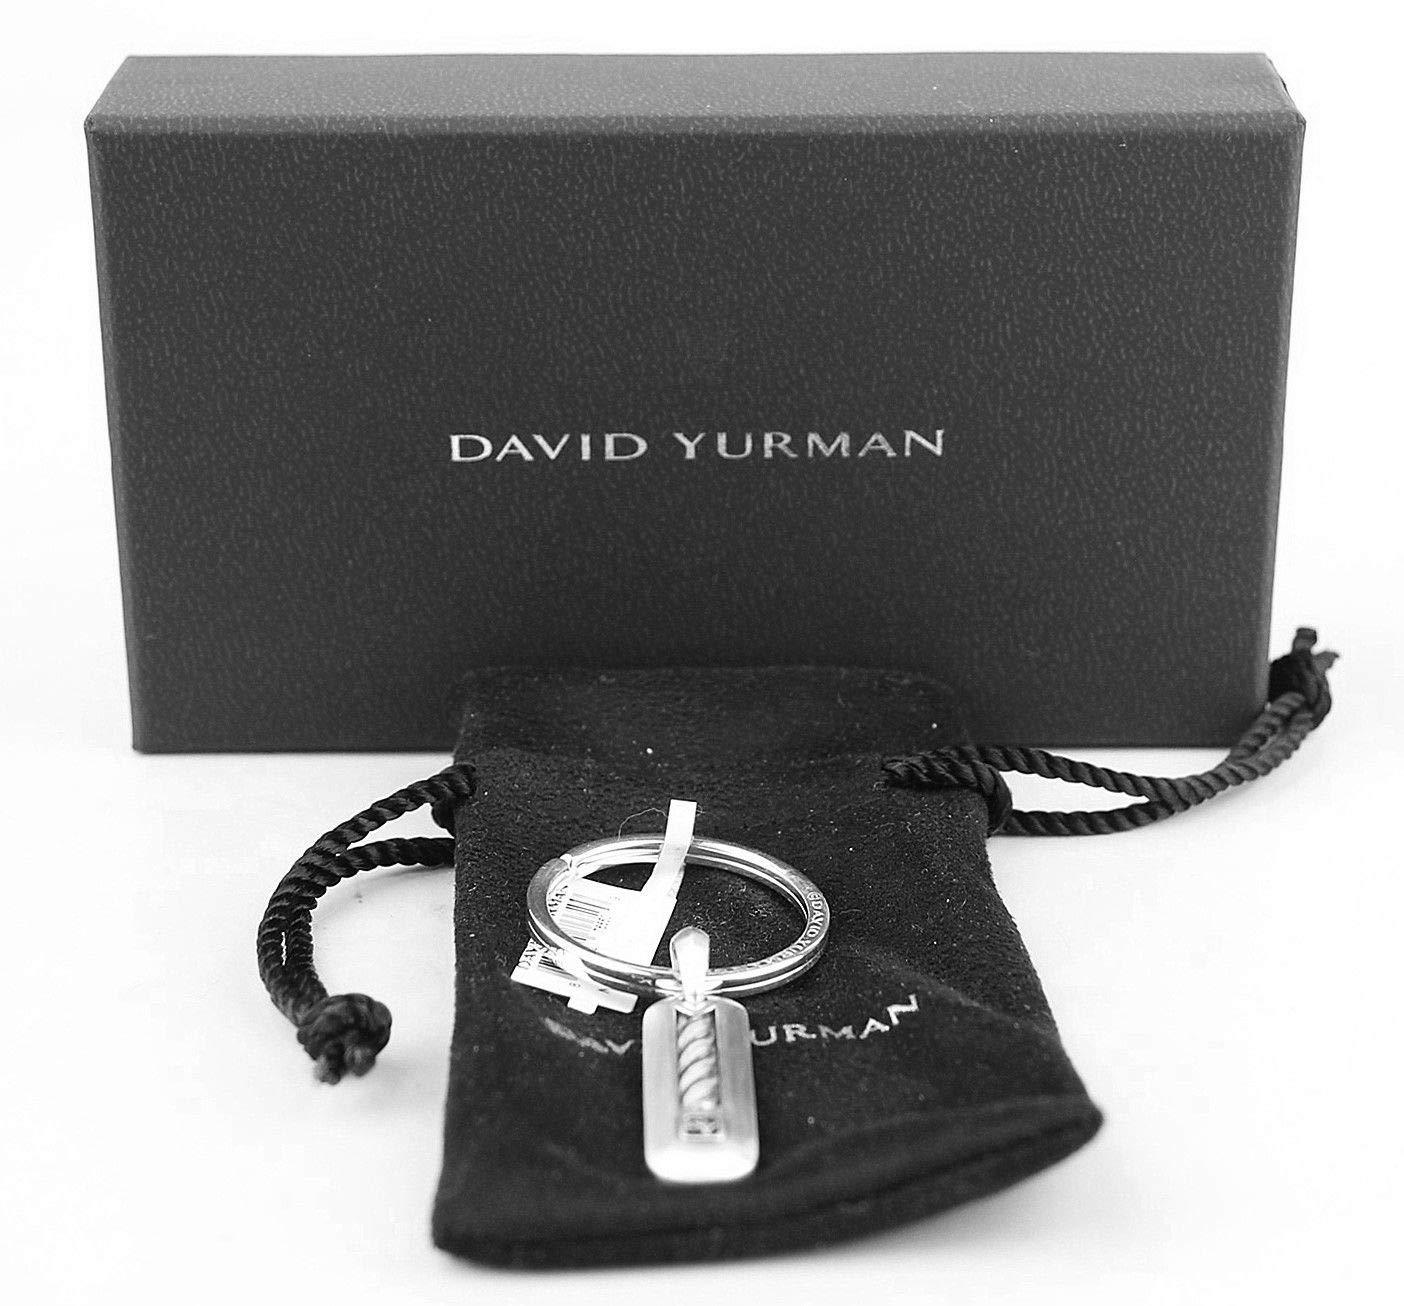 DAVID YURMAN STERLING SILVER CABLE CLASSICS KEY RING KEYCHAIN by David Yurman Silver (Image #7)